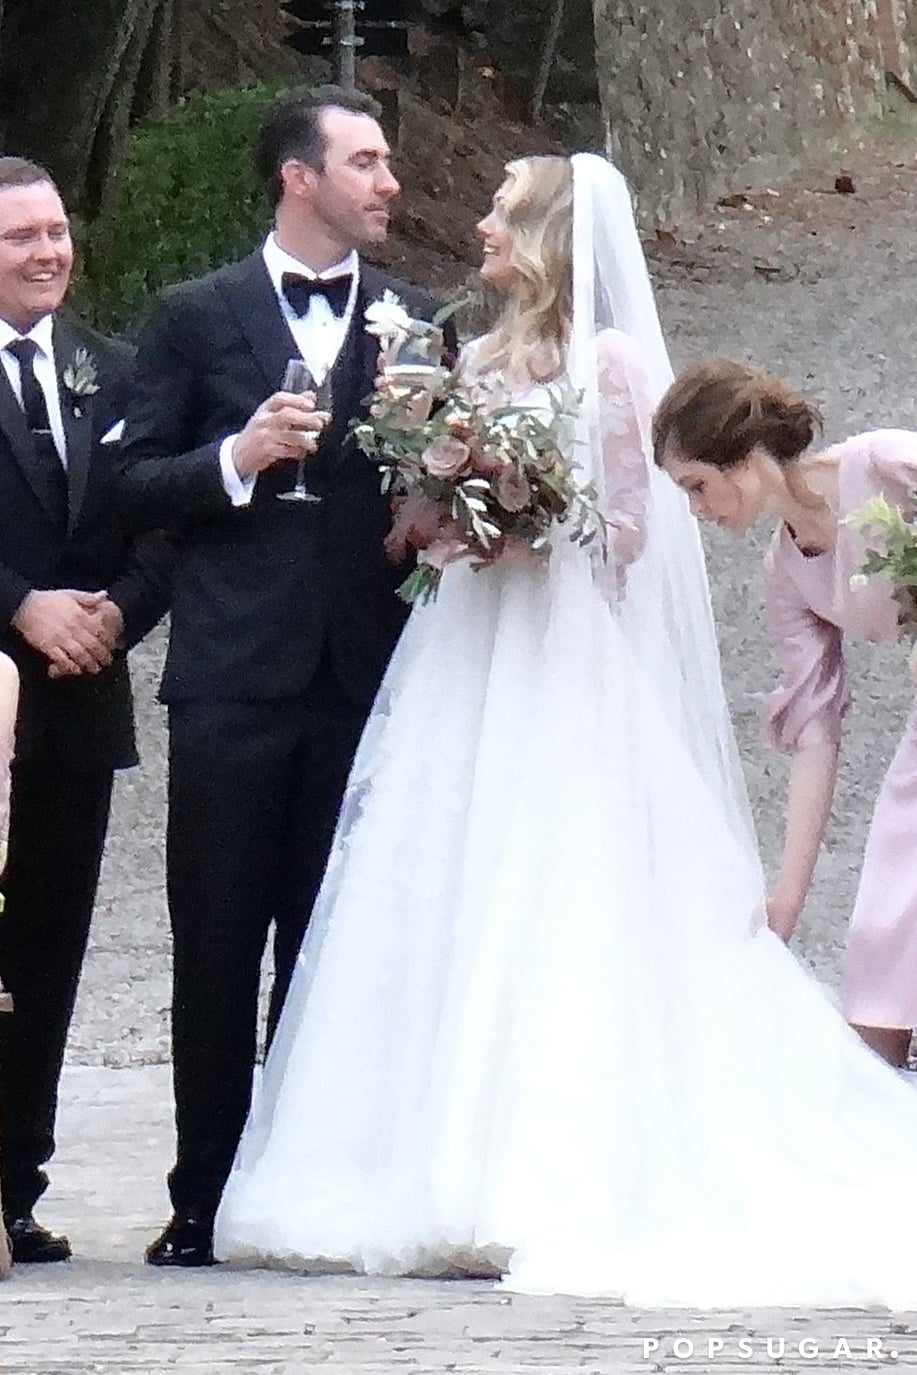 Kate Upton Wedding Dress.Kate Upton Wore A Modest Sheer Sleeved Wedding Dress By Valentino